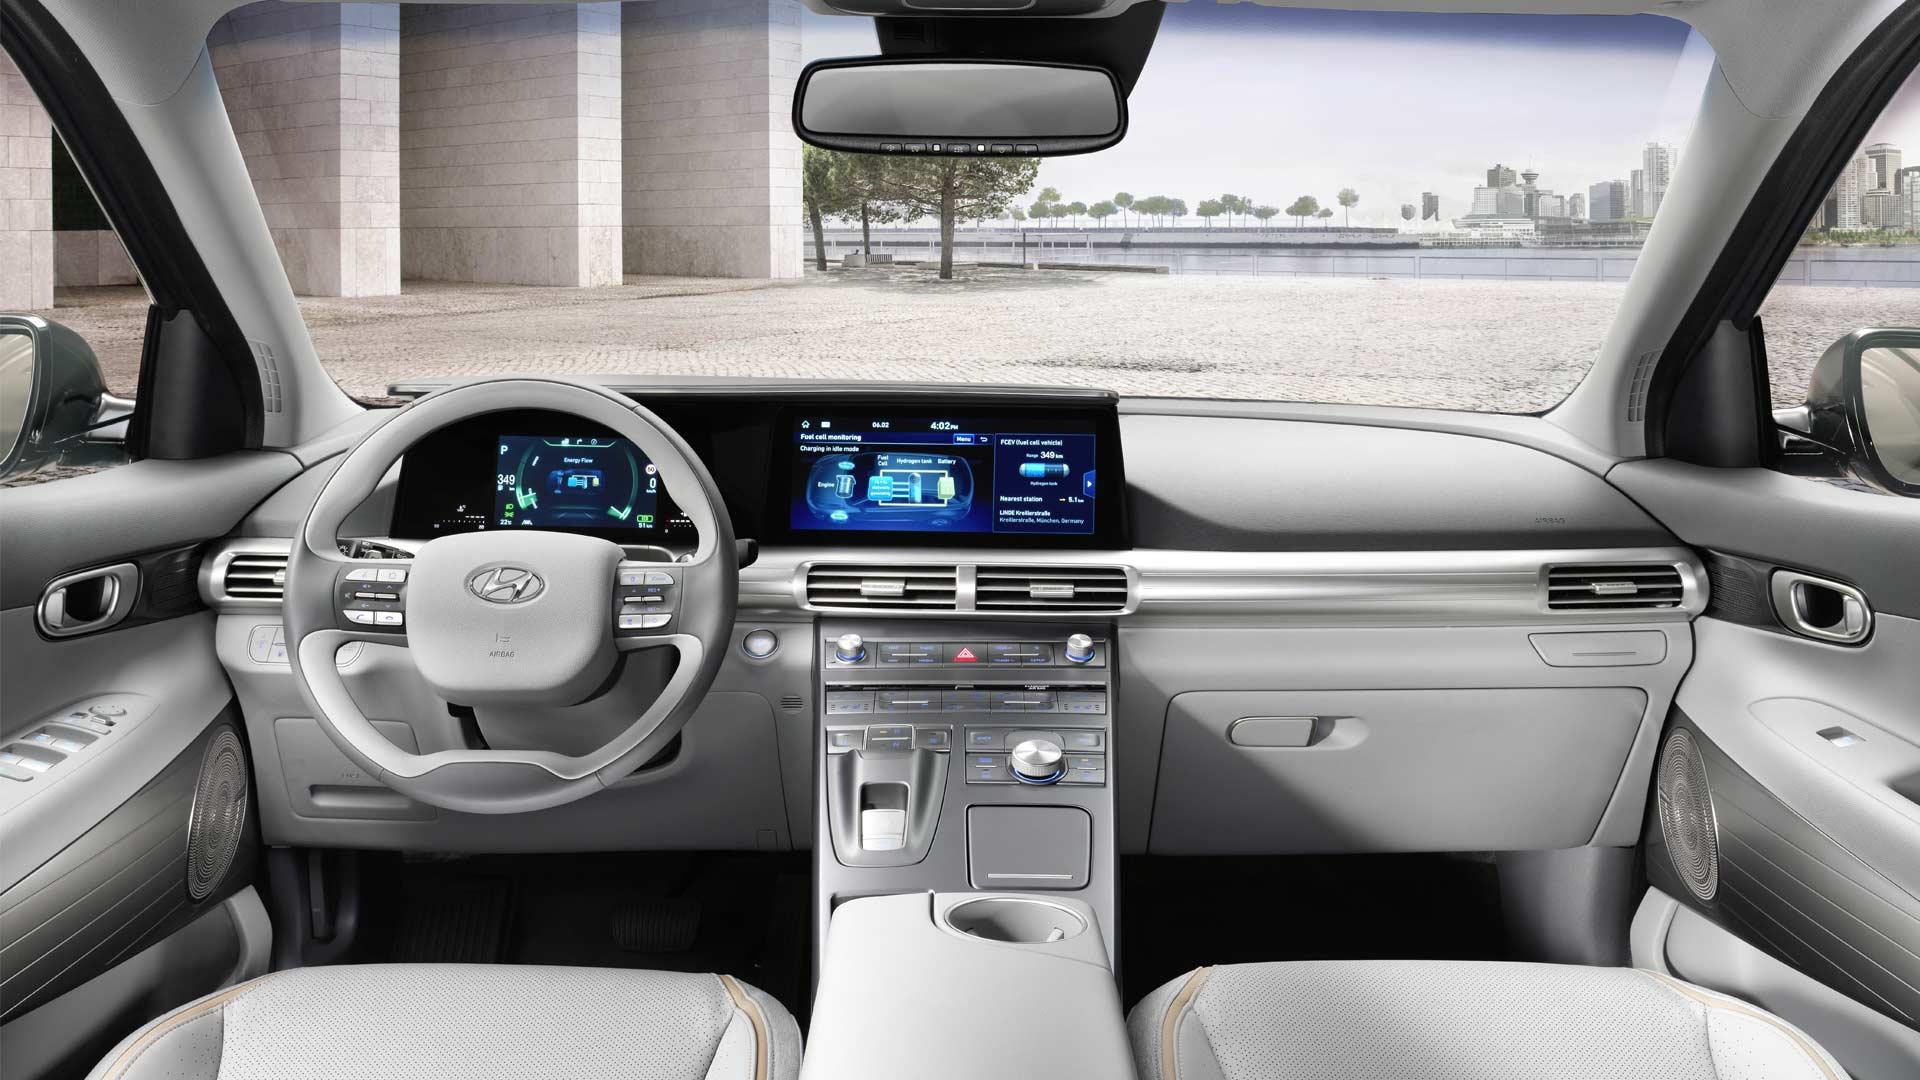 hyundai names its next gen fuel cell vehicle nexo autodevot. Black Bedroom Furniture Sets. Home Design Ideas